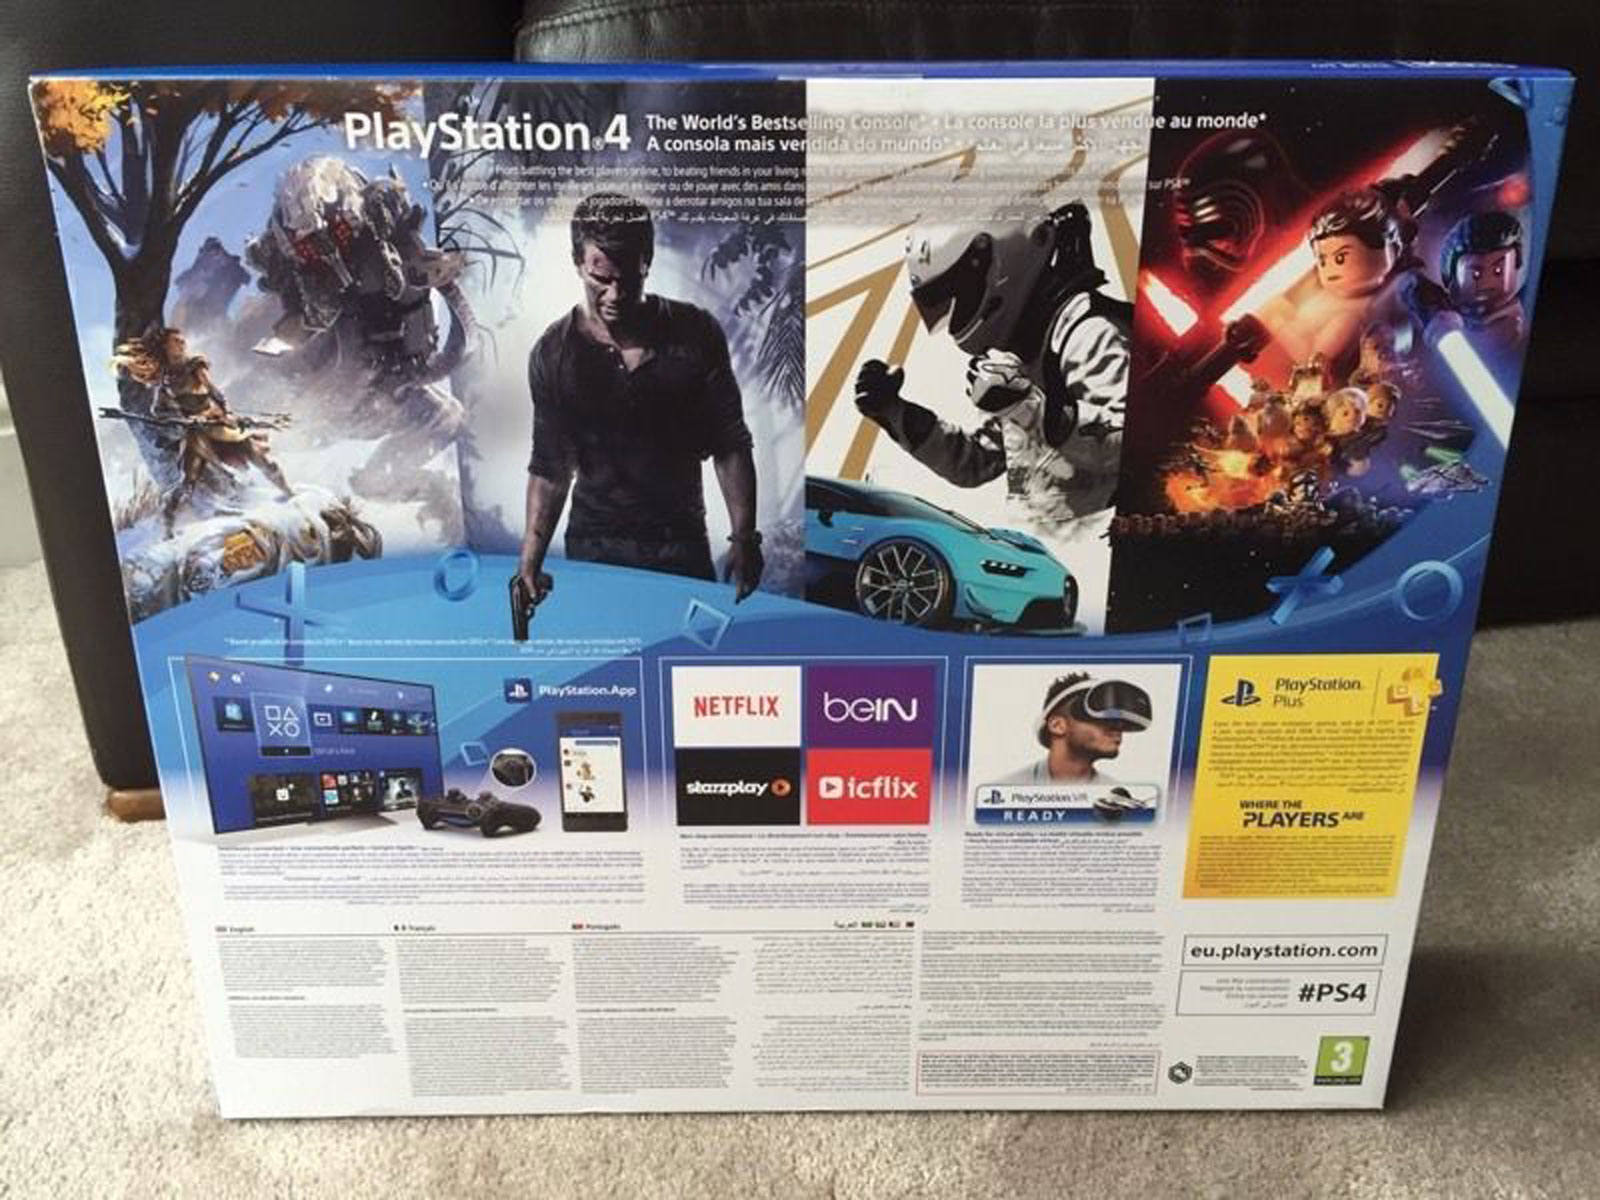 The PS4 'slim' box